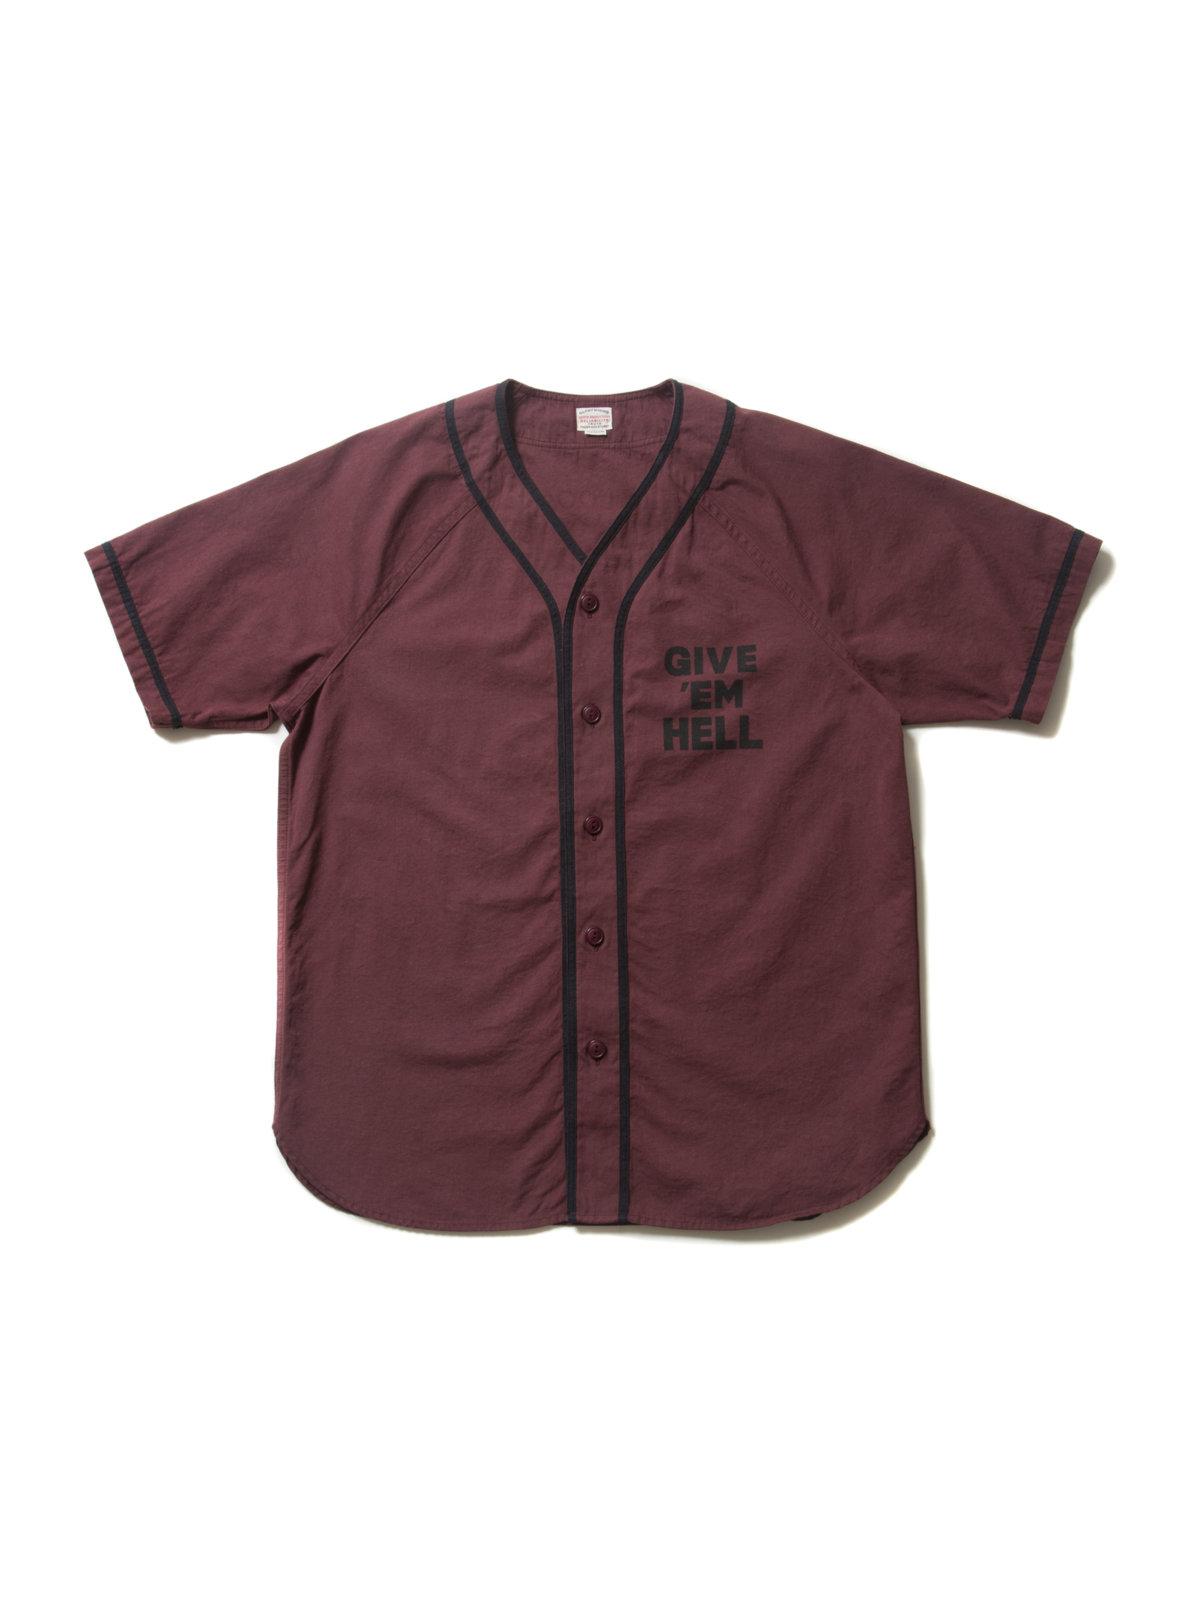 Ballgame Shirt-Burgundy-